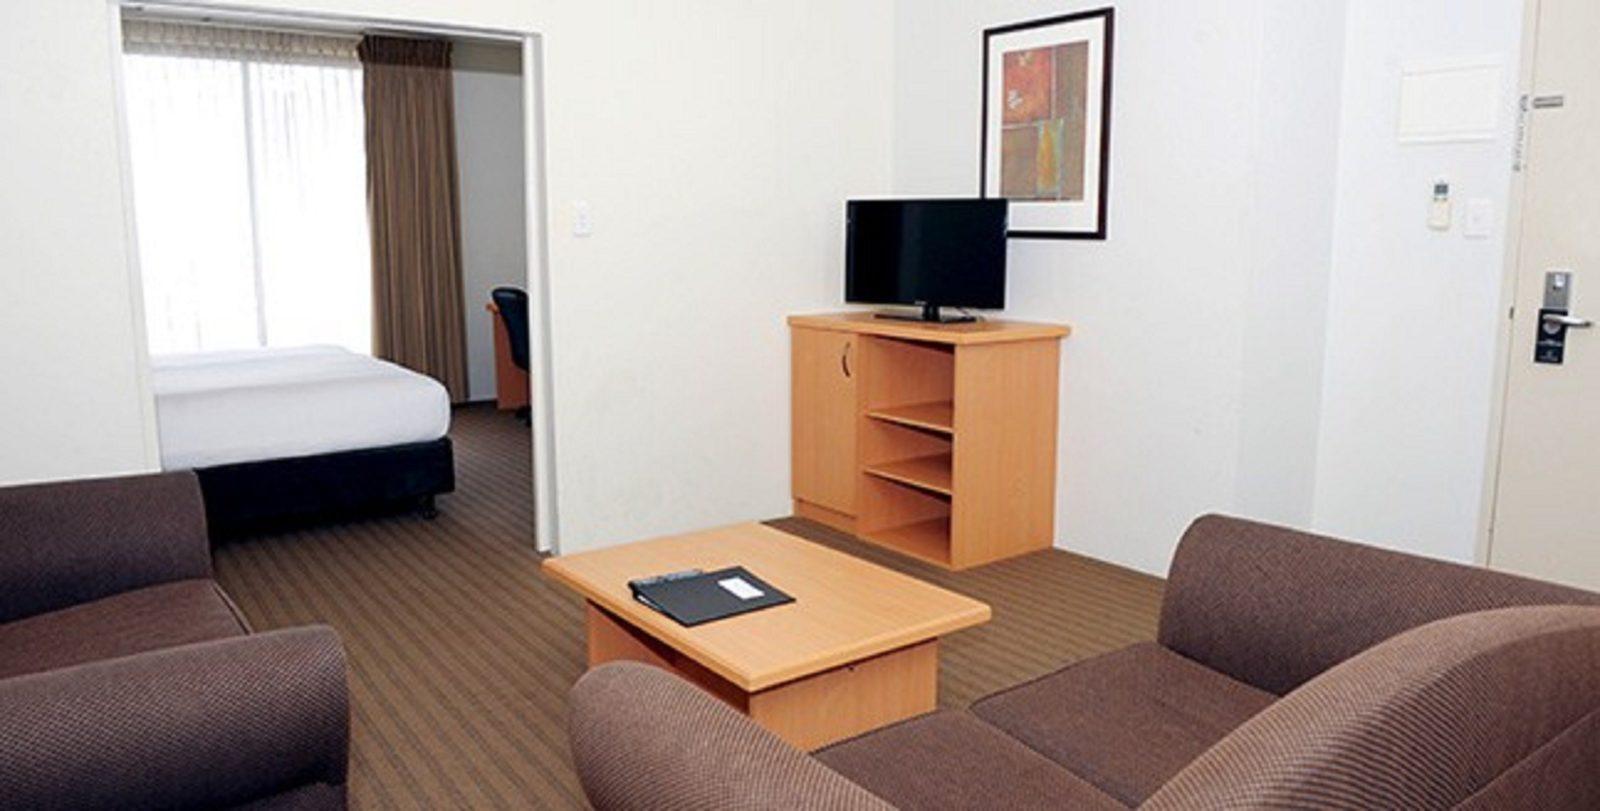 All Suites Perth, Perth, Western Australia